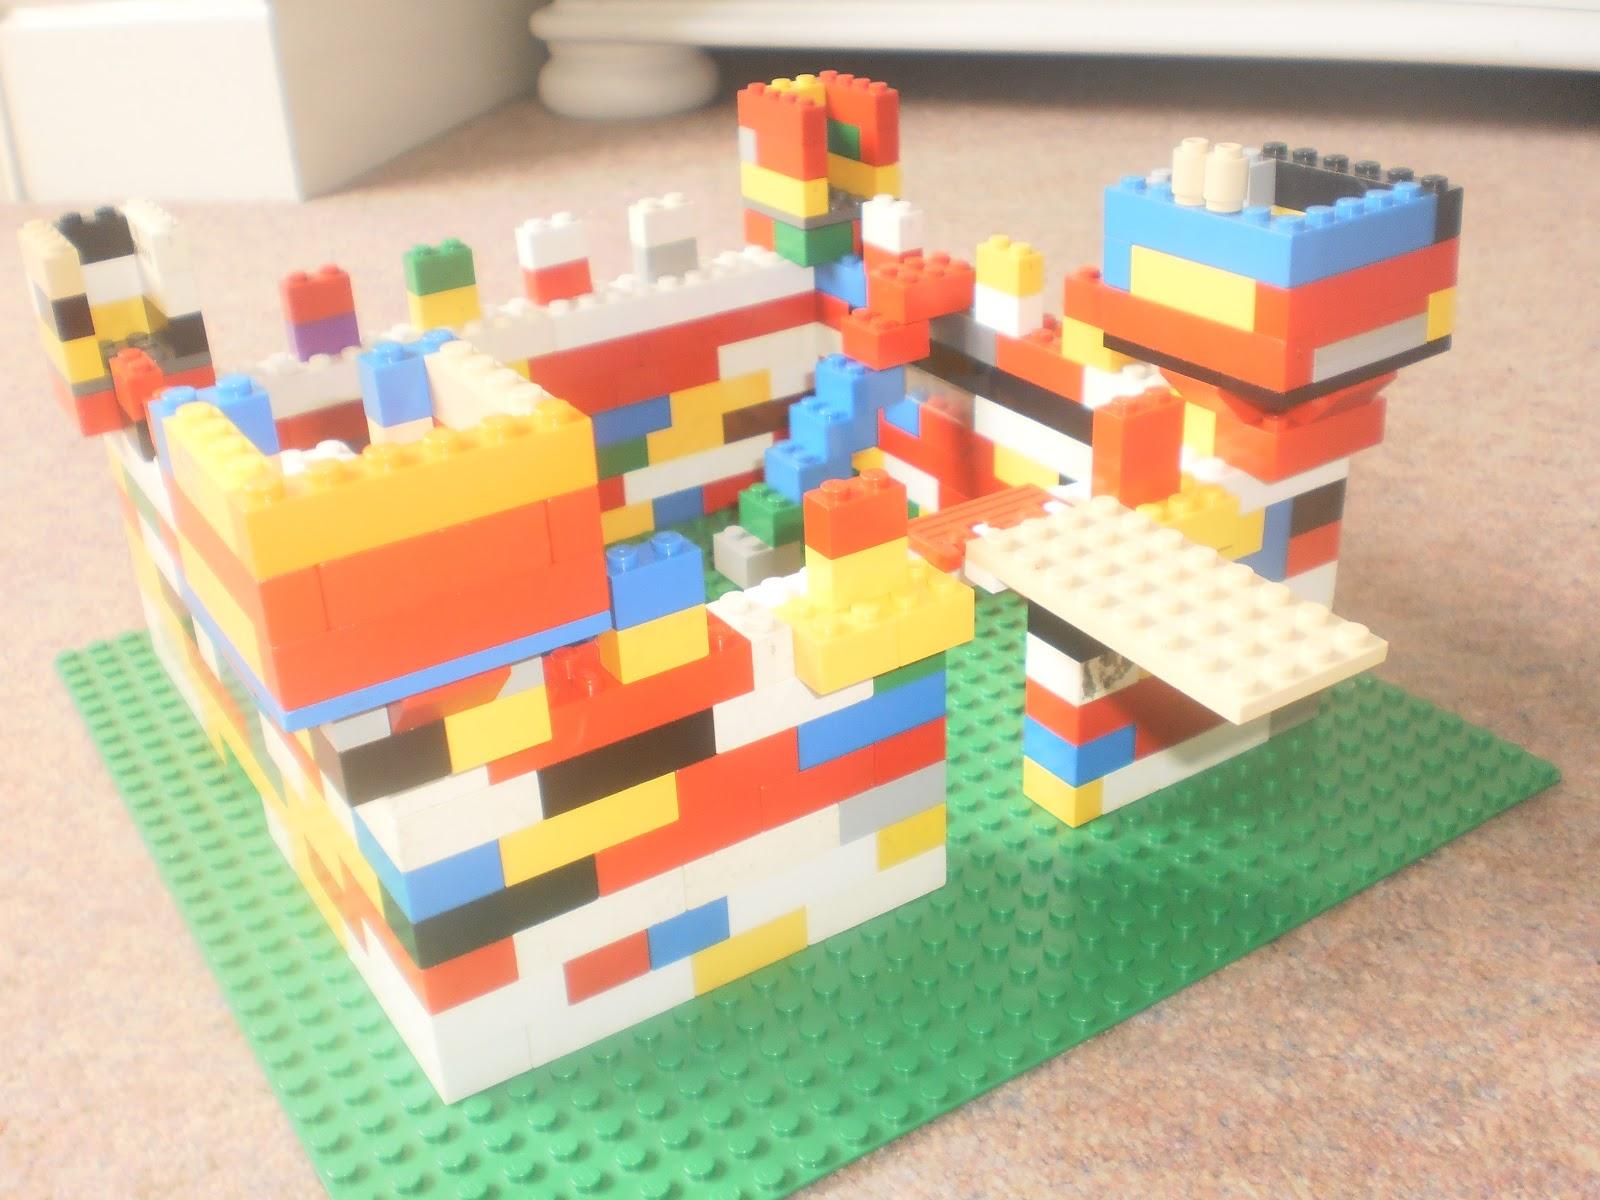 Moostly cards crochet juli 2012 - Hoe een overdekt terras te bouwen ...